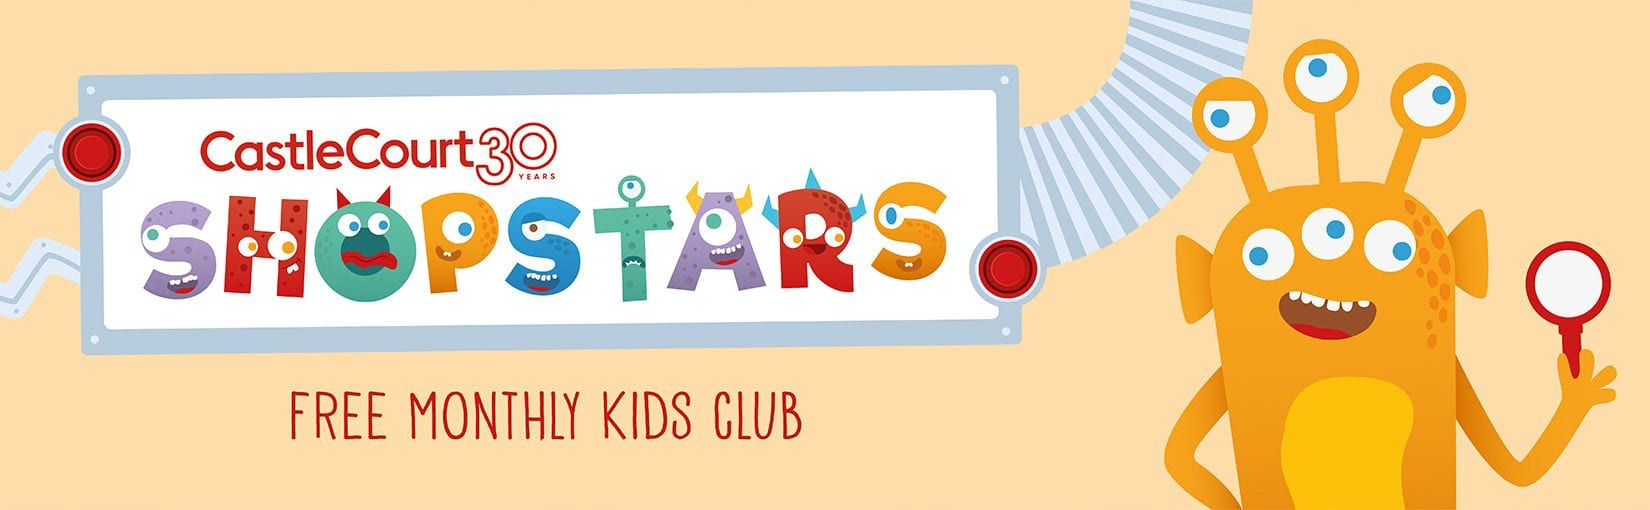 Shopstars Website Single Banner 01